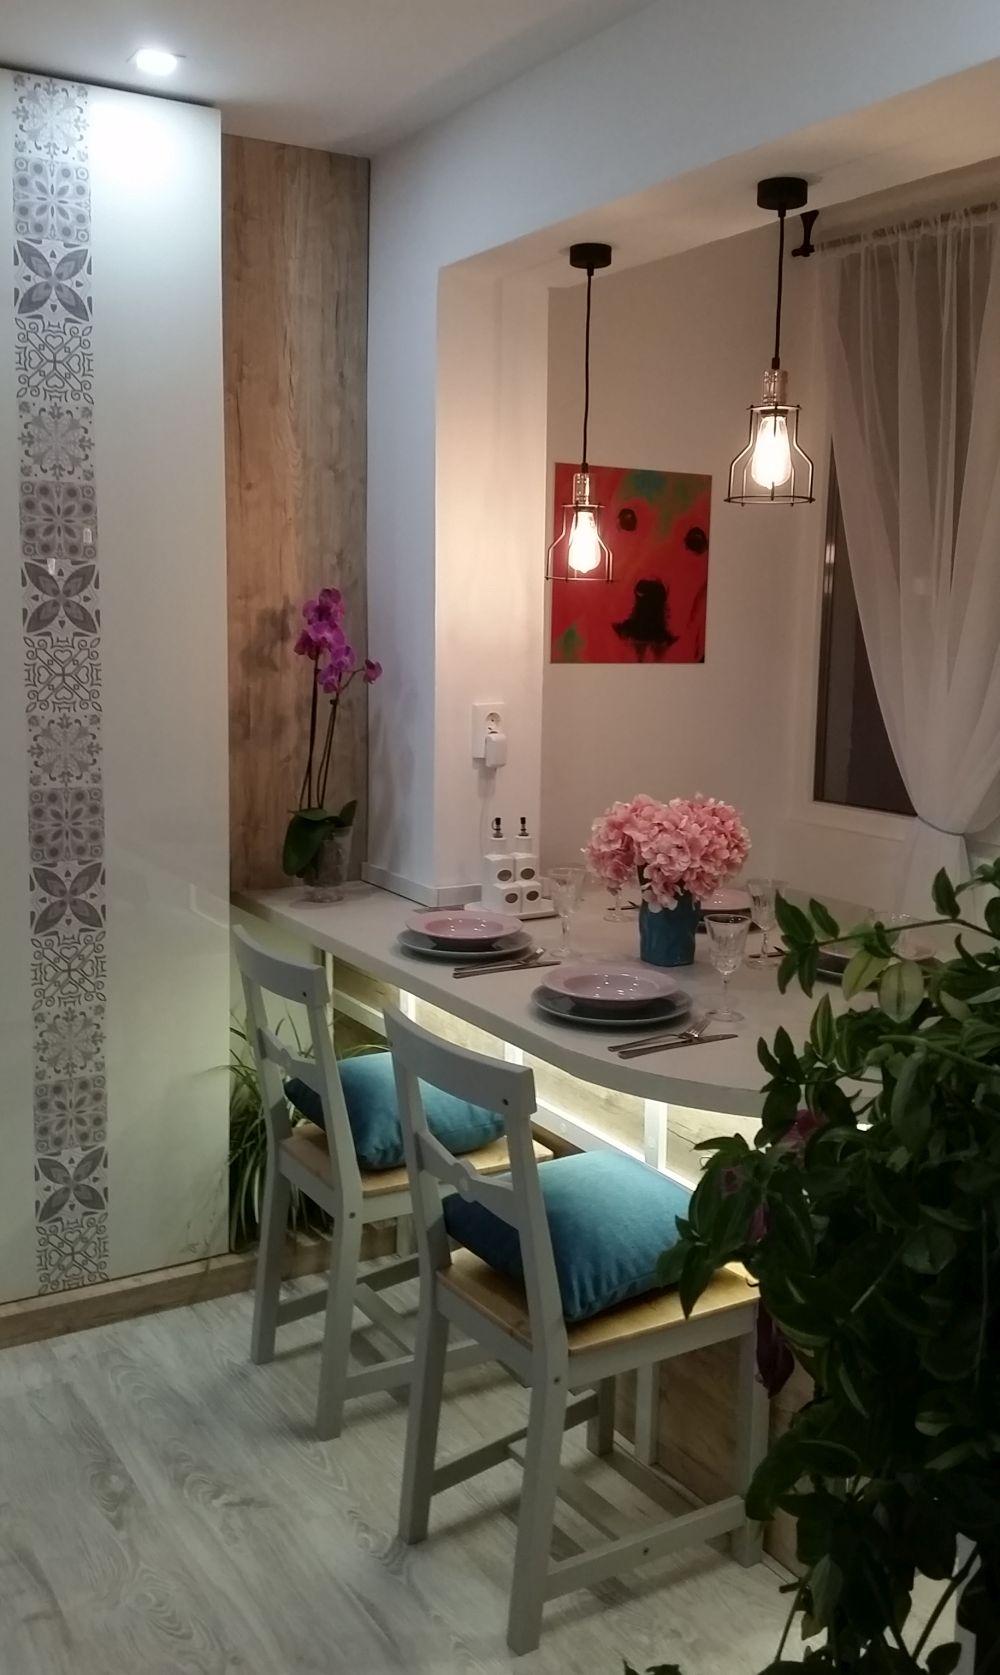 adelaparvu-com-despre-apartamentul-familiei-tudorache-ploiesti-episodul-9-sezonul-3-visuri-la-cheie-foto-adela-parvu-7